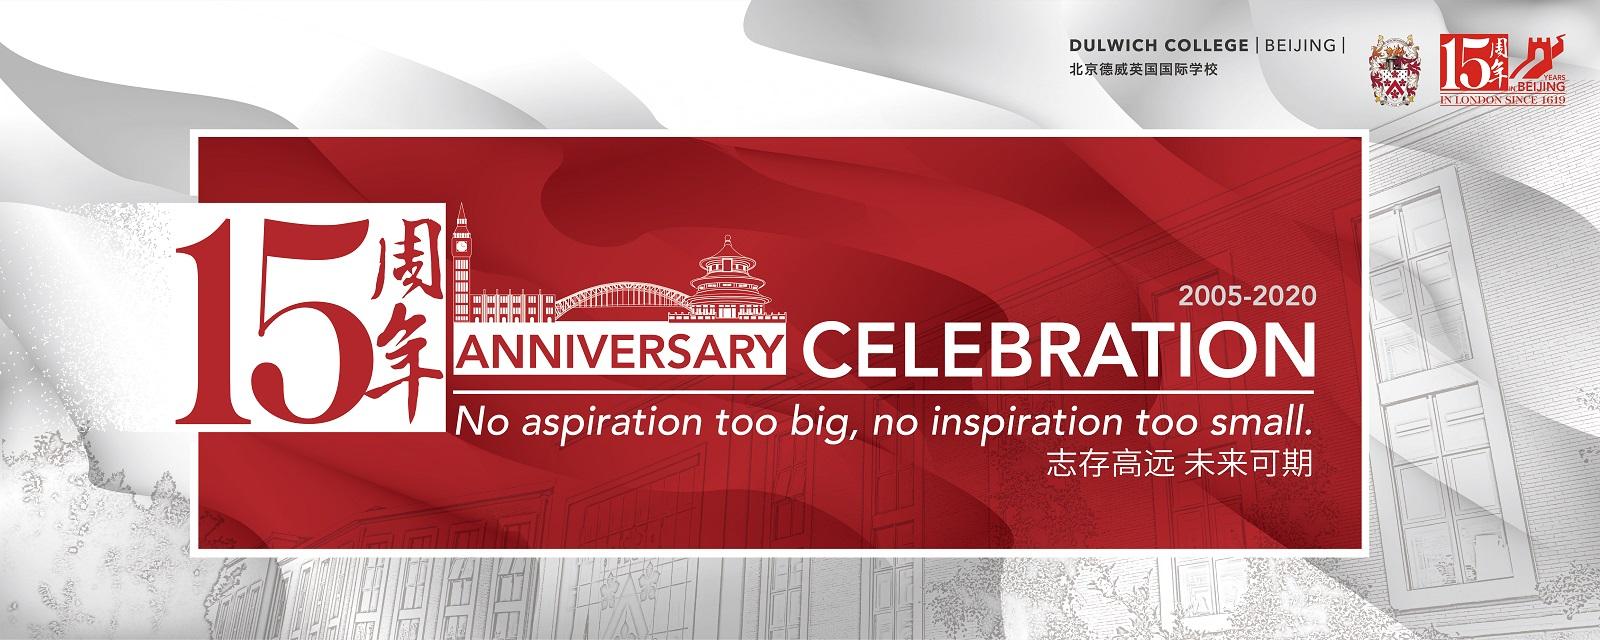 15th Anniversary slogan and logo